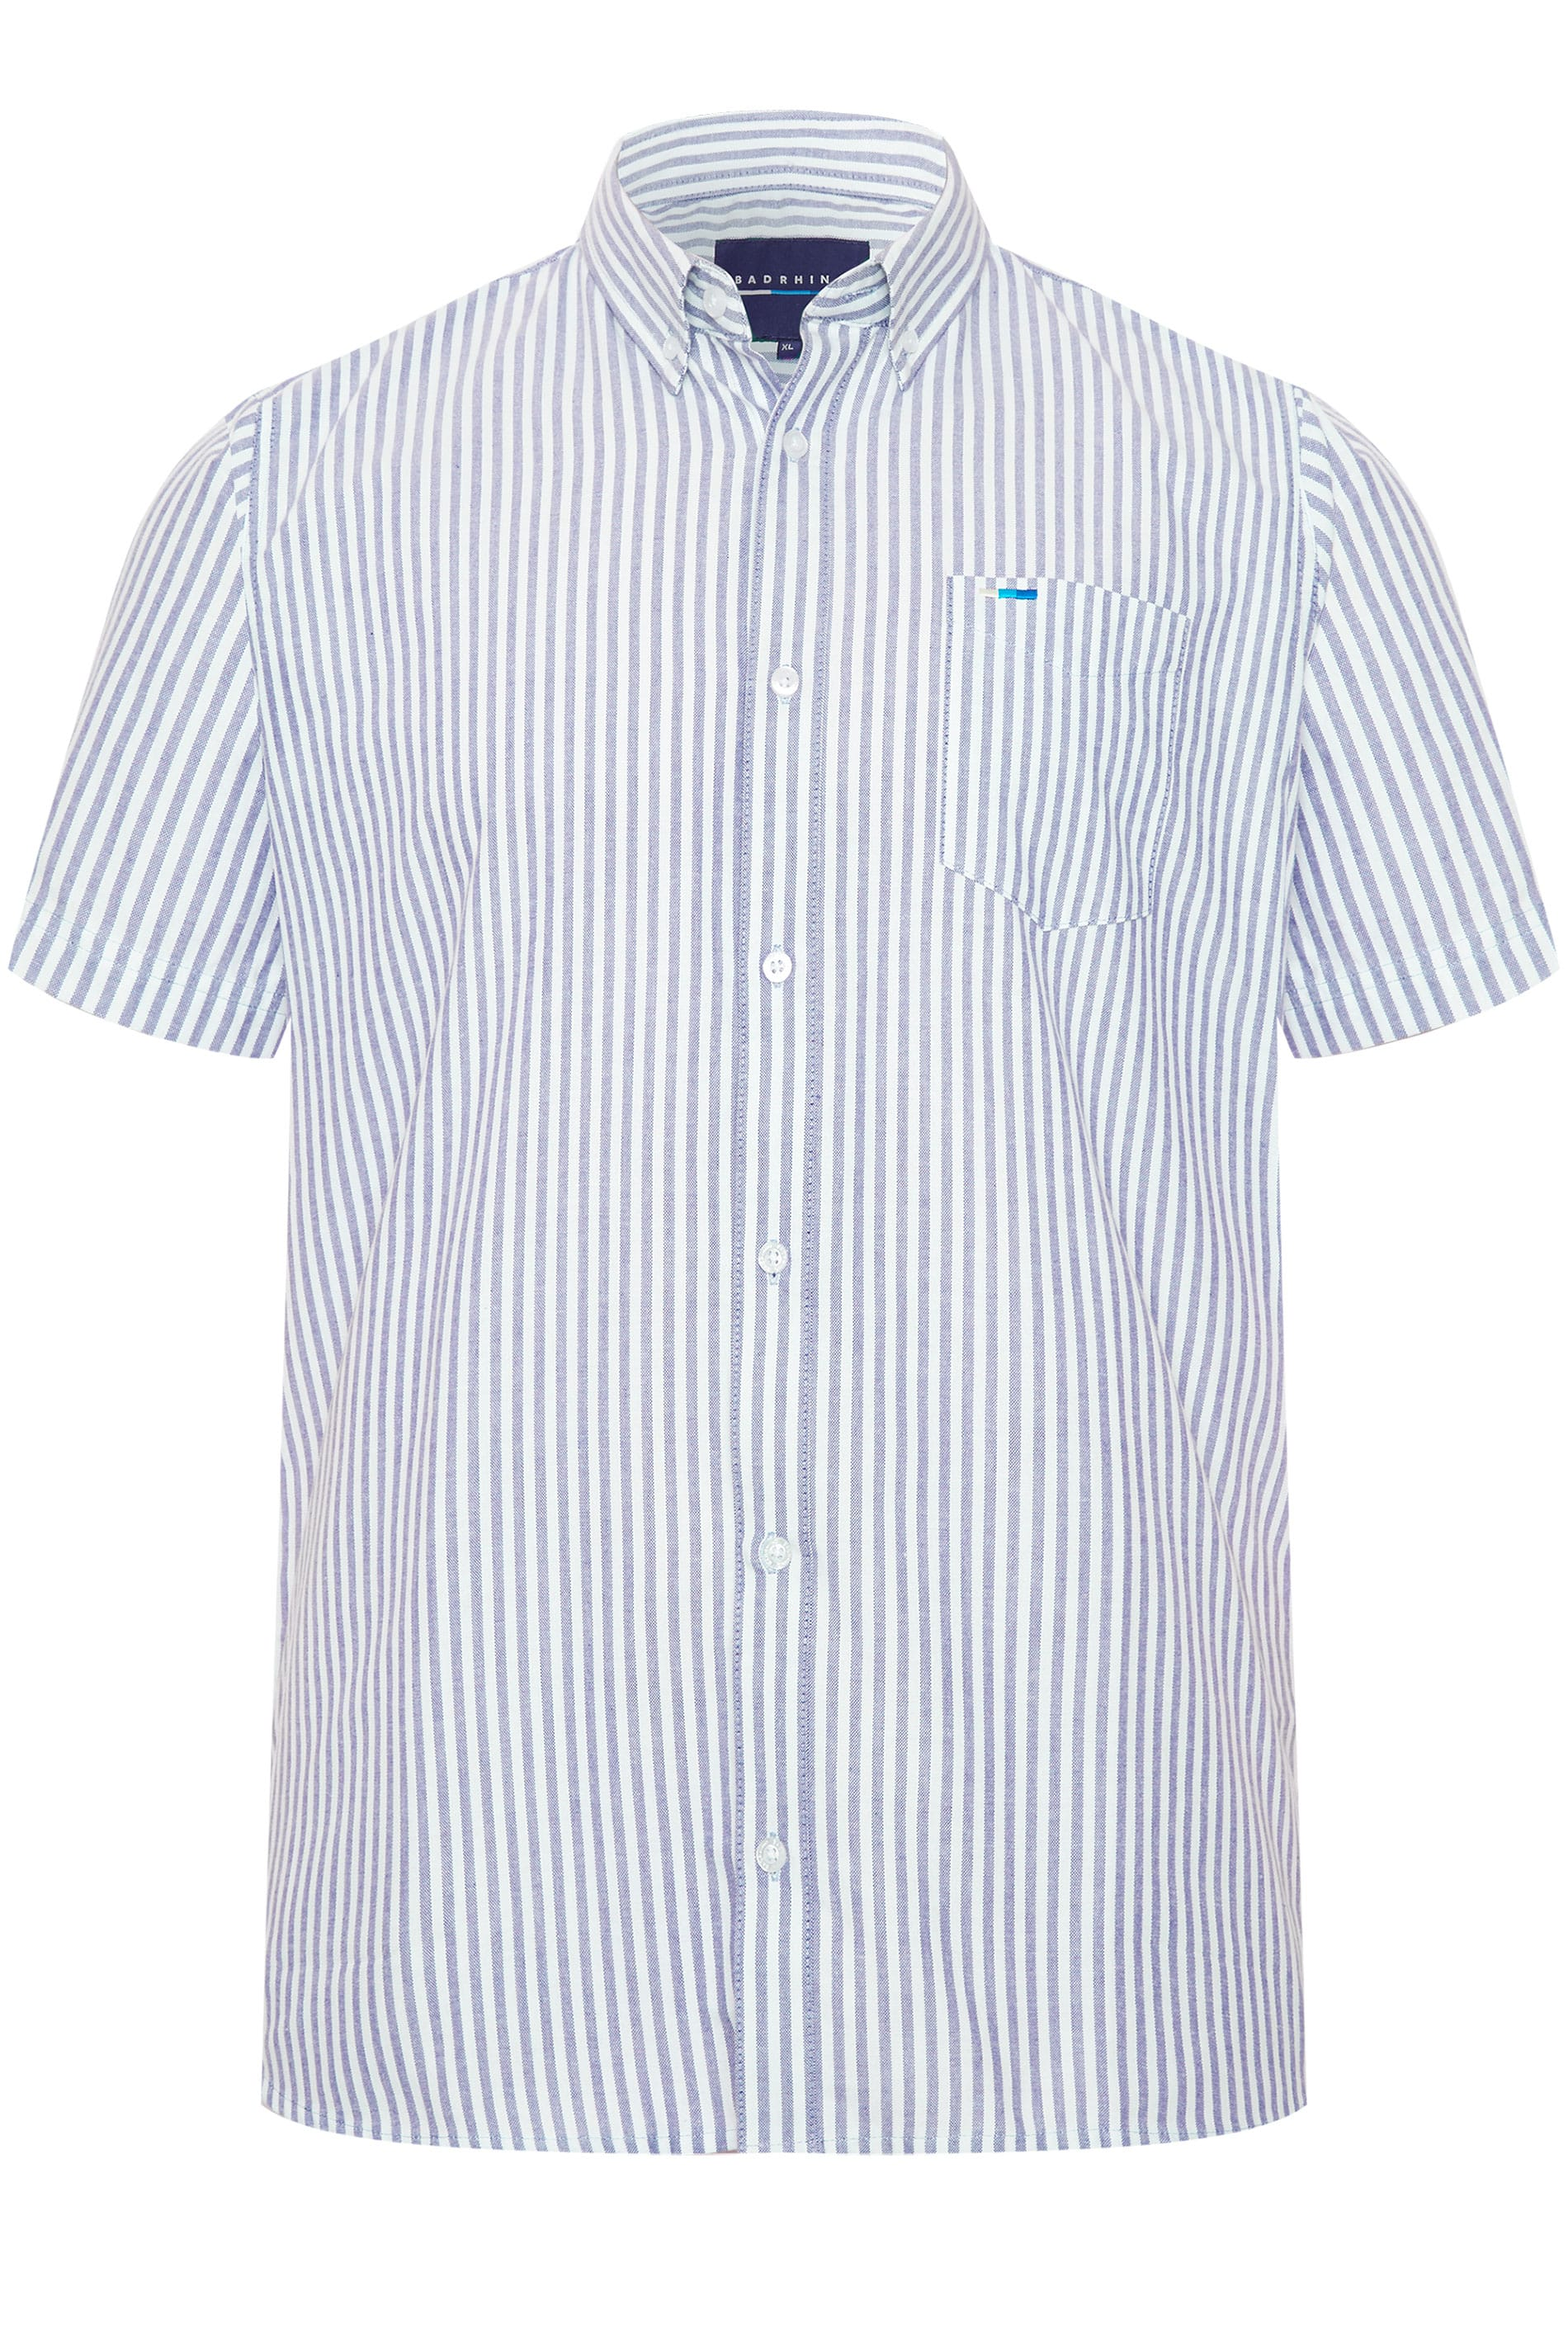 BadRhino Blue Striped Short Sleeved Oxford Shirt_fb1d.jpg